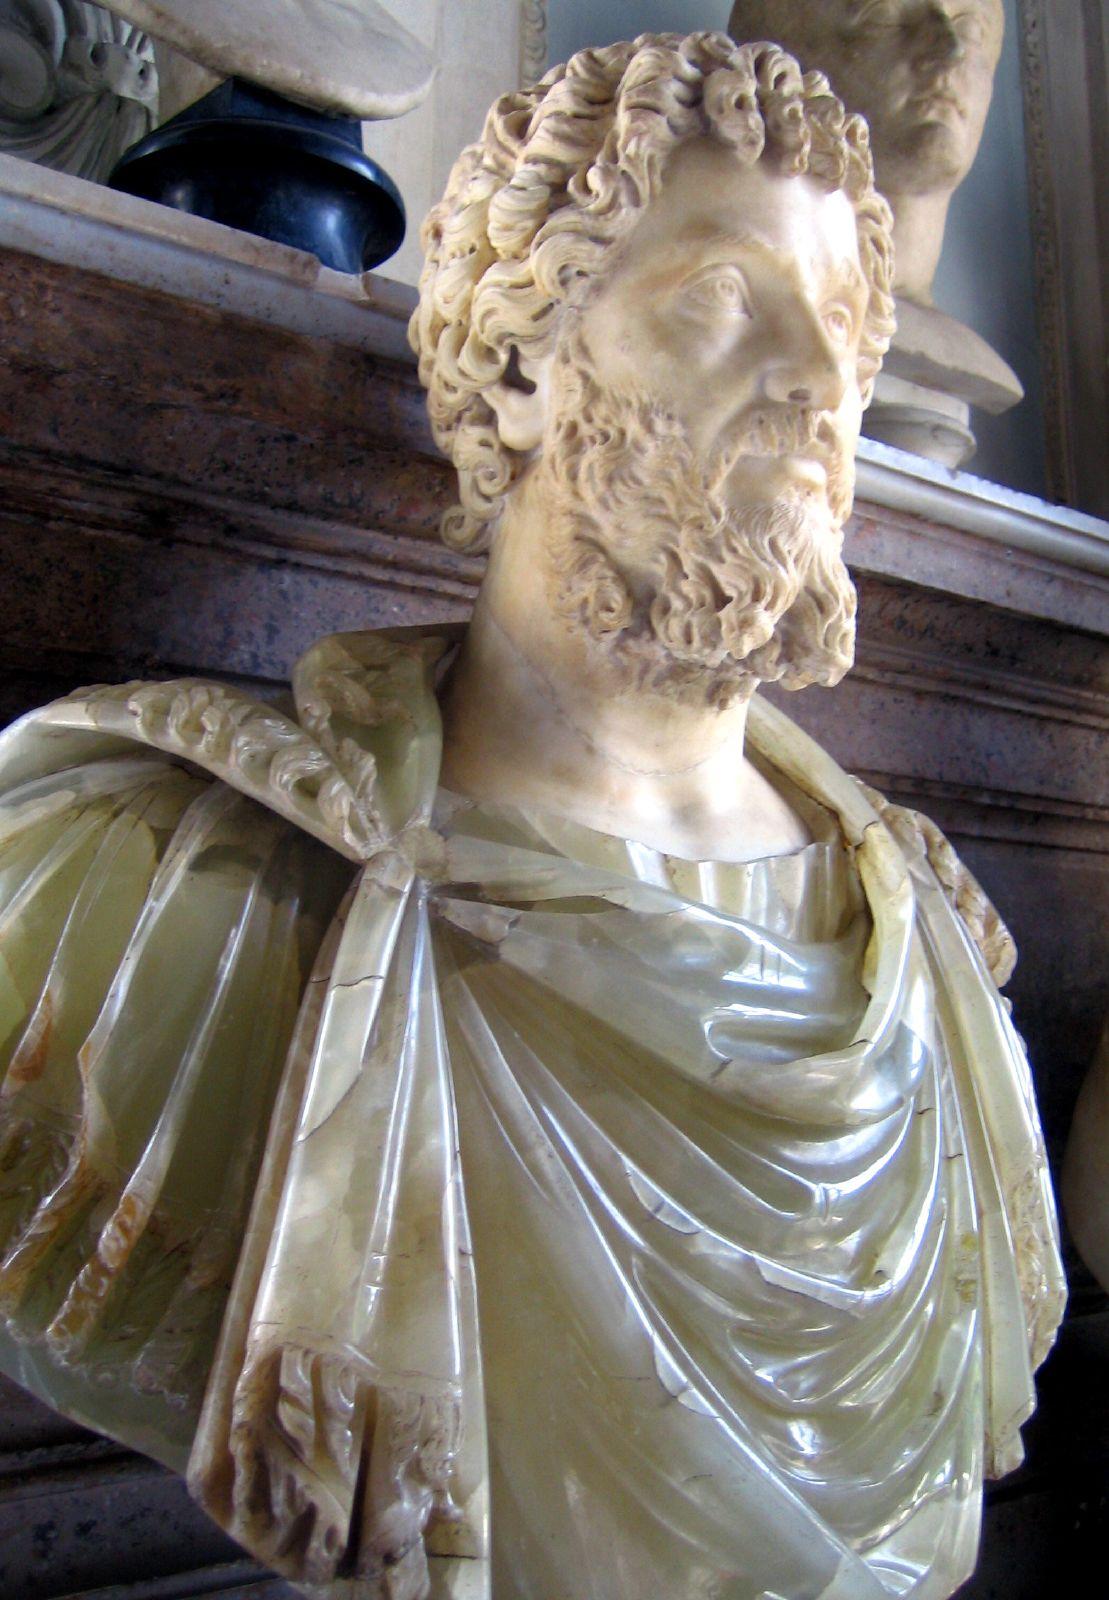 http://upload.wikimedia.org/wikipedia/commons/1/13/Septimius_Severus_busto-Musei_Capitolini.jpg